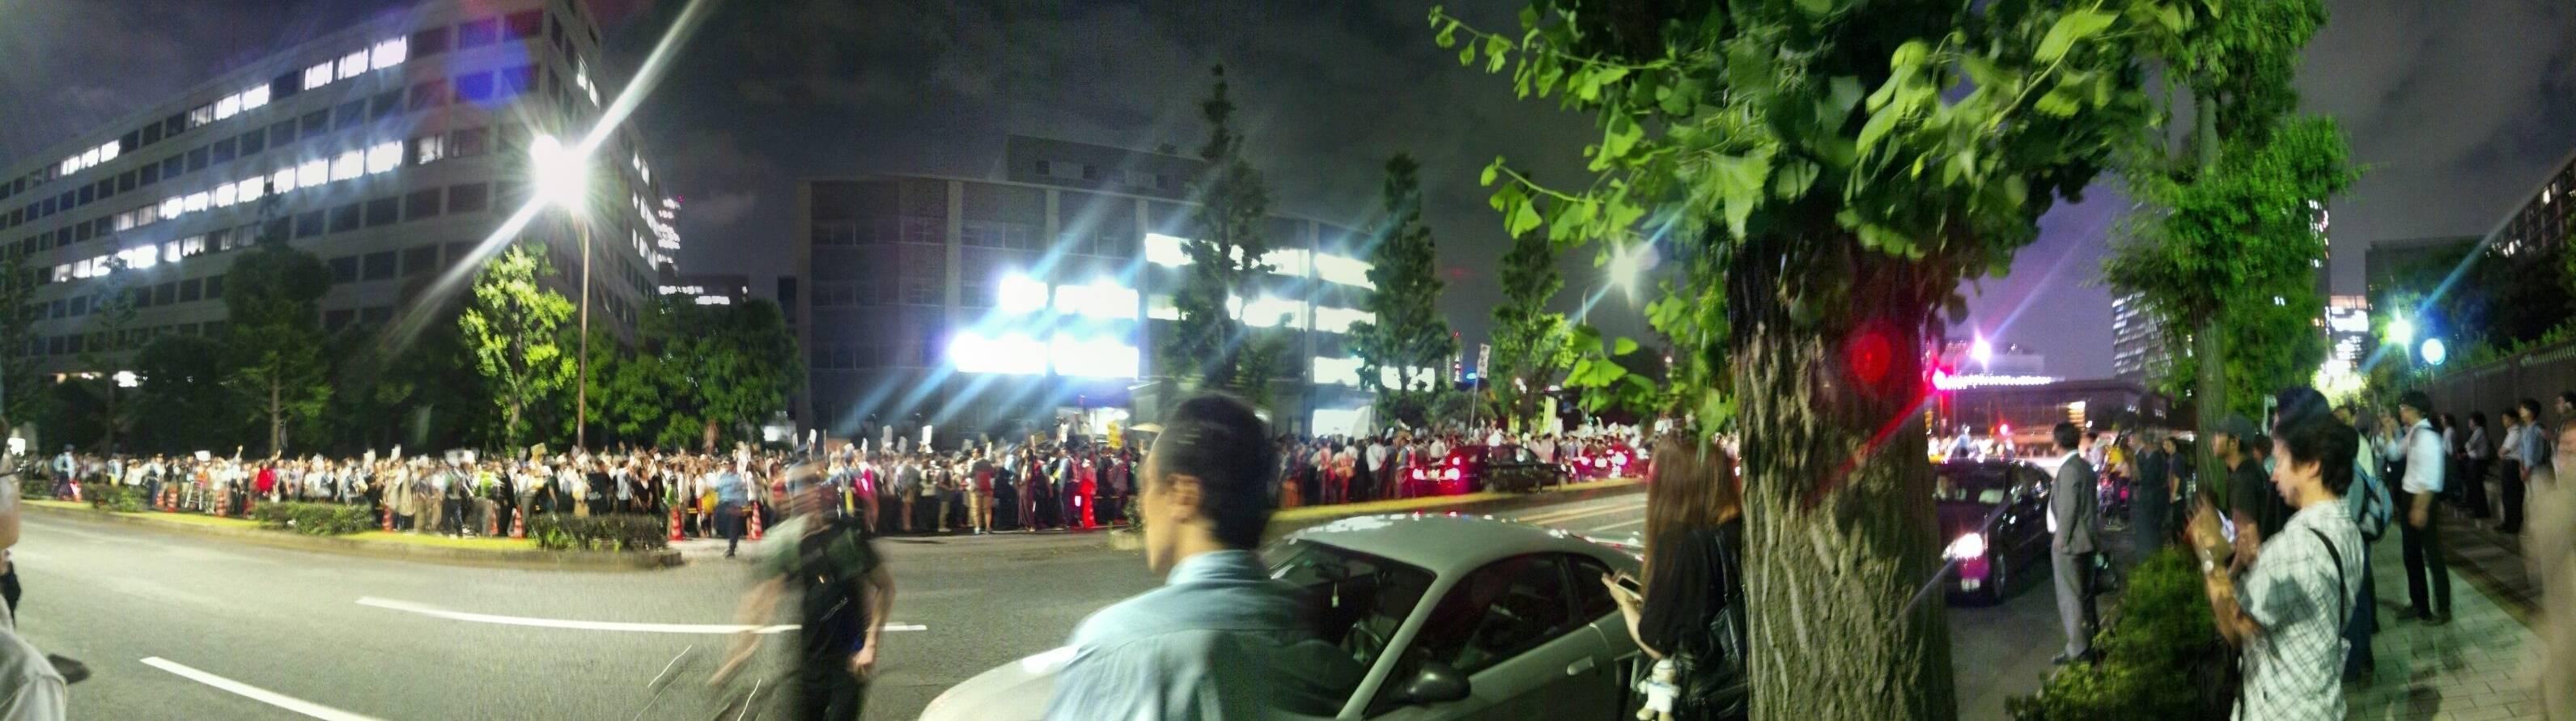 [Hydrangea revolution] 45,000 joined demonstration against the restart of Ohi nuclear plant 25